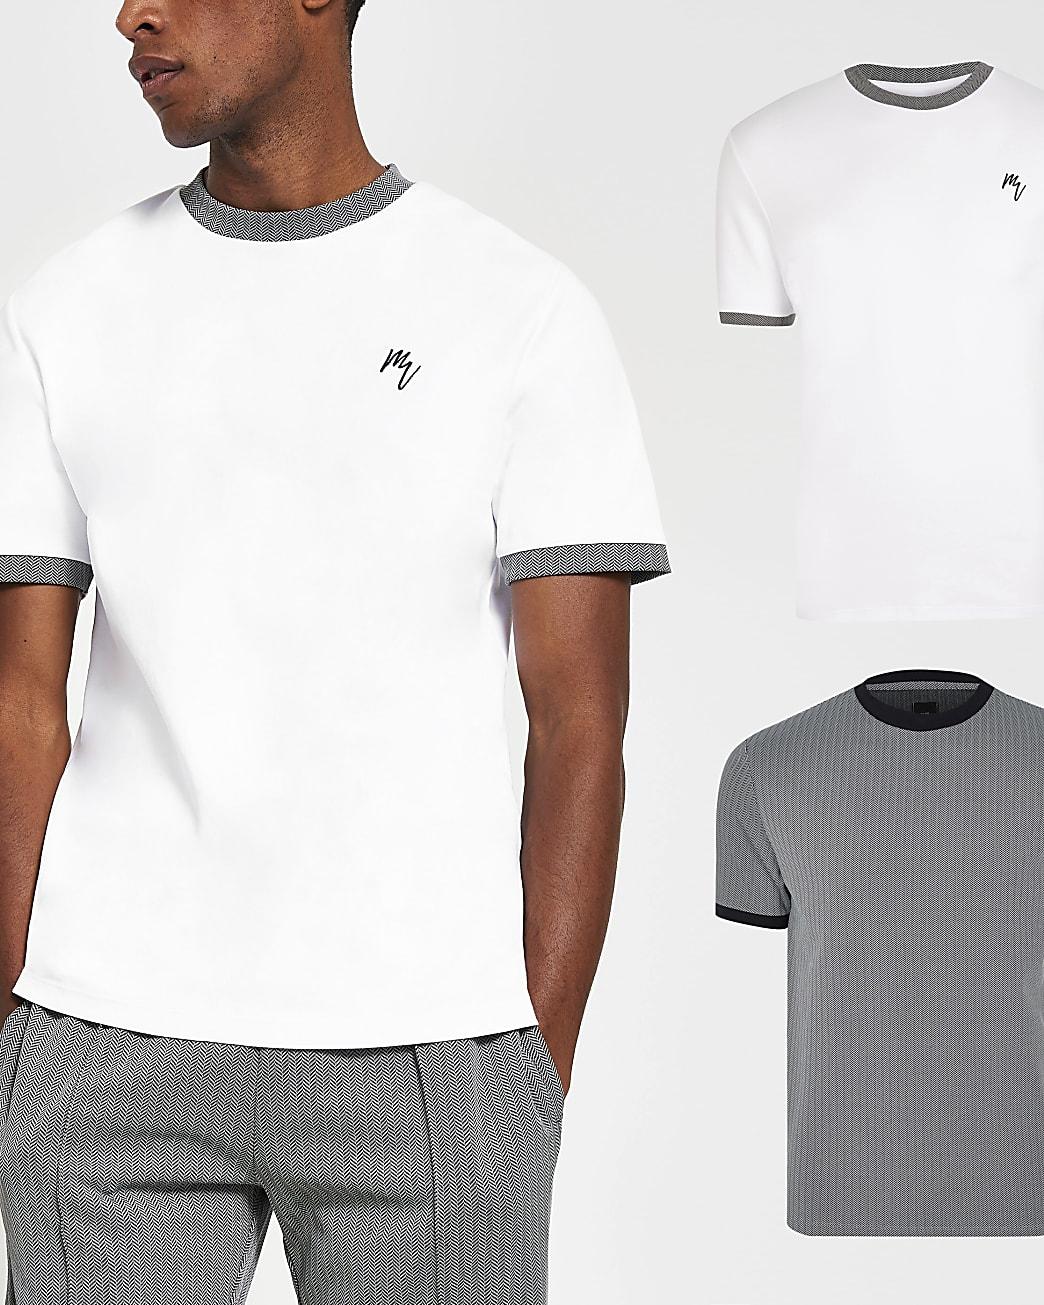 Maison Riviera slim fit t-shirt 2 pack